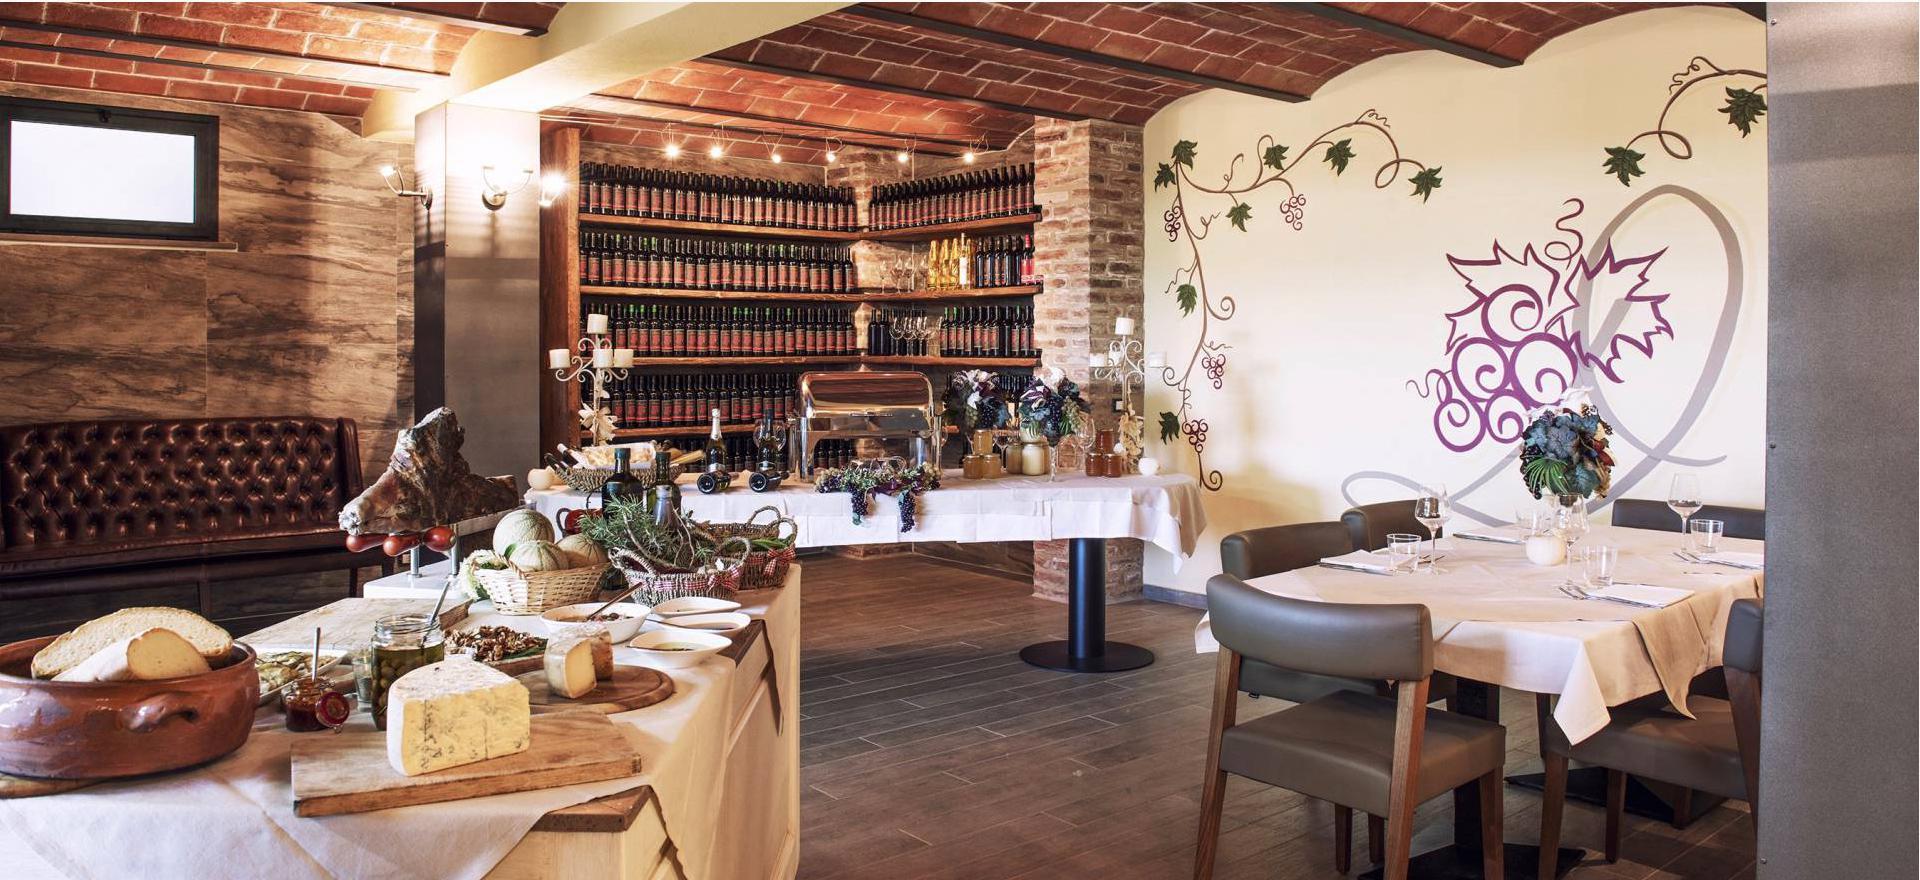 Agriturismo Toscane Familievriendelijke glamping in Toscane